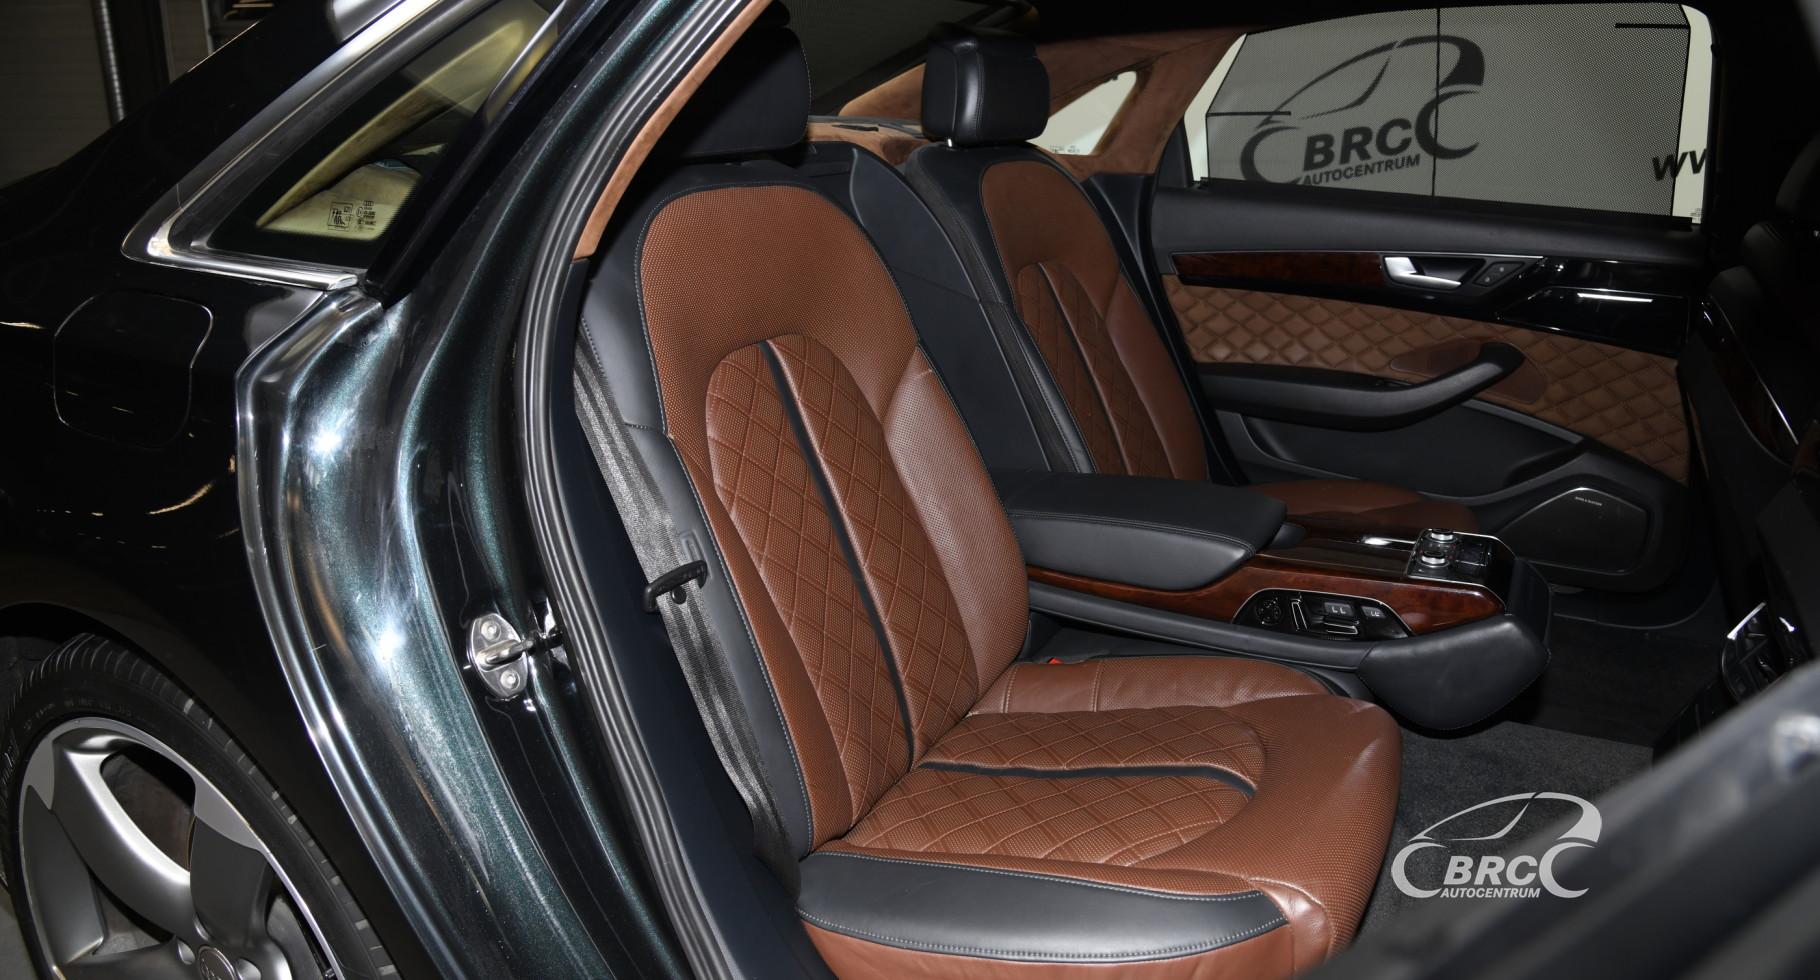 Audi A8 L 3.0 TDI Quattro Automatas